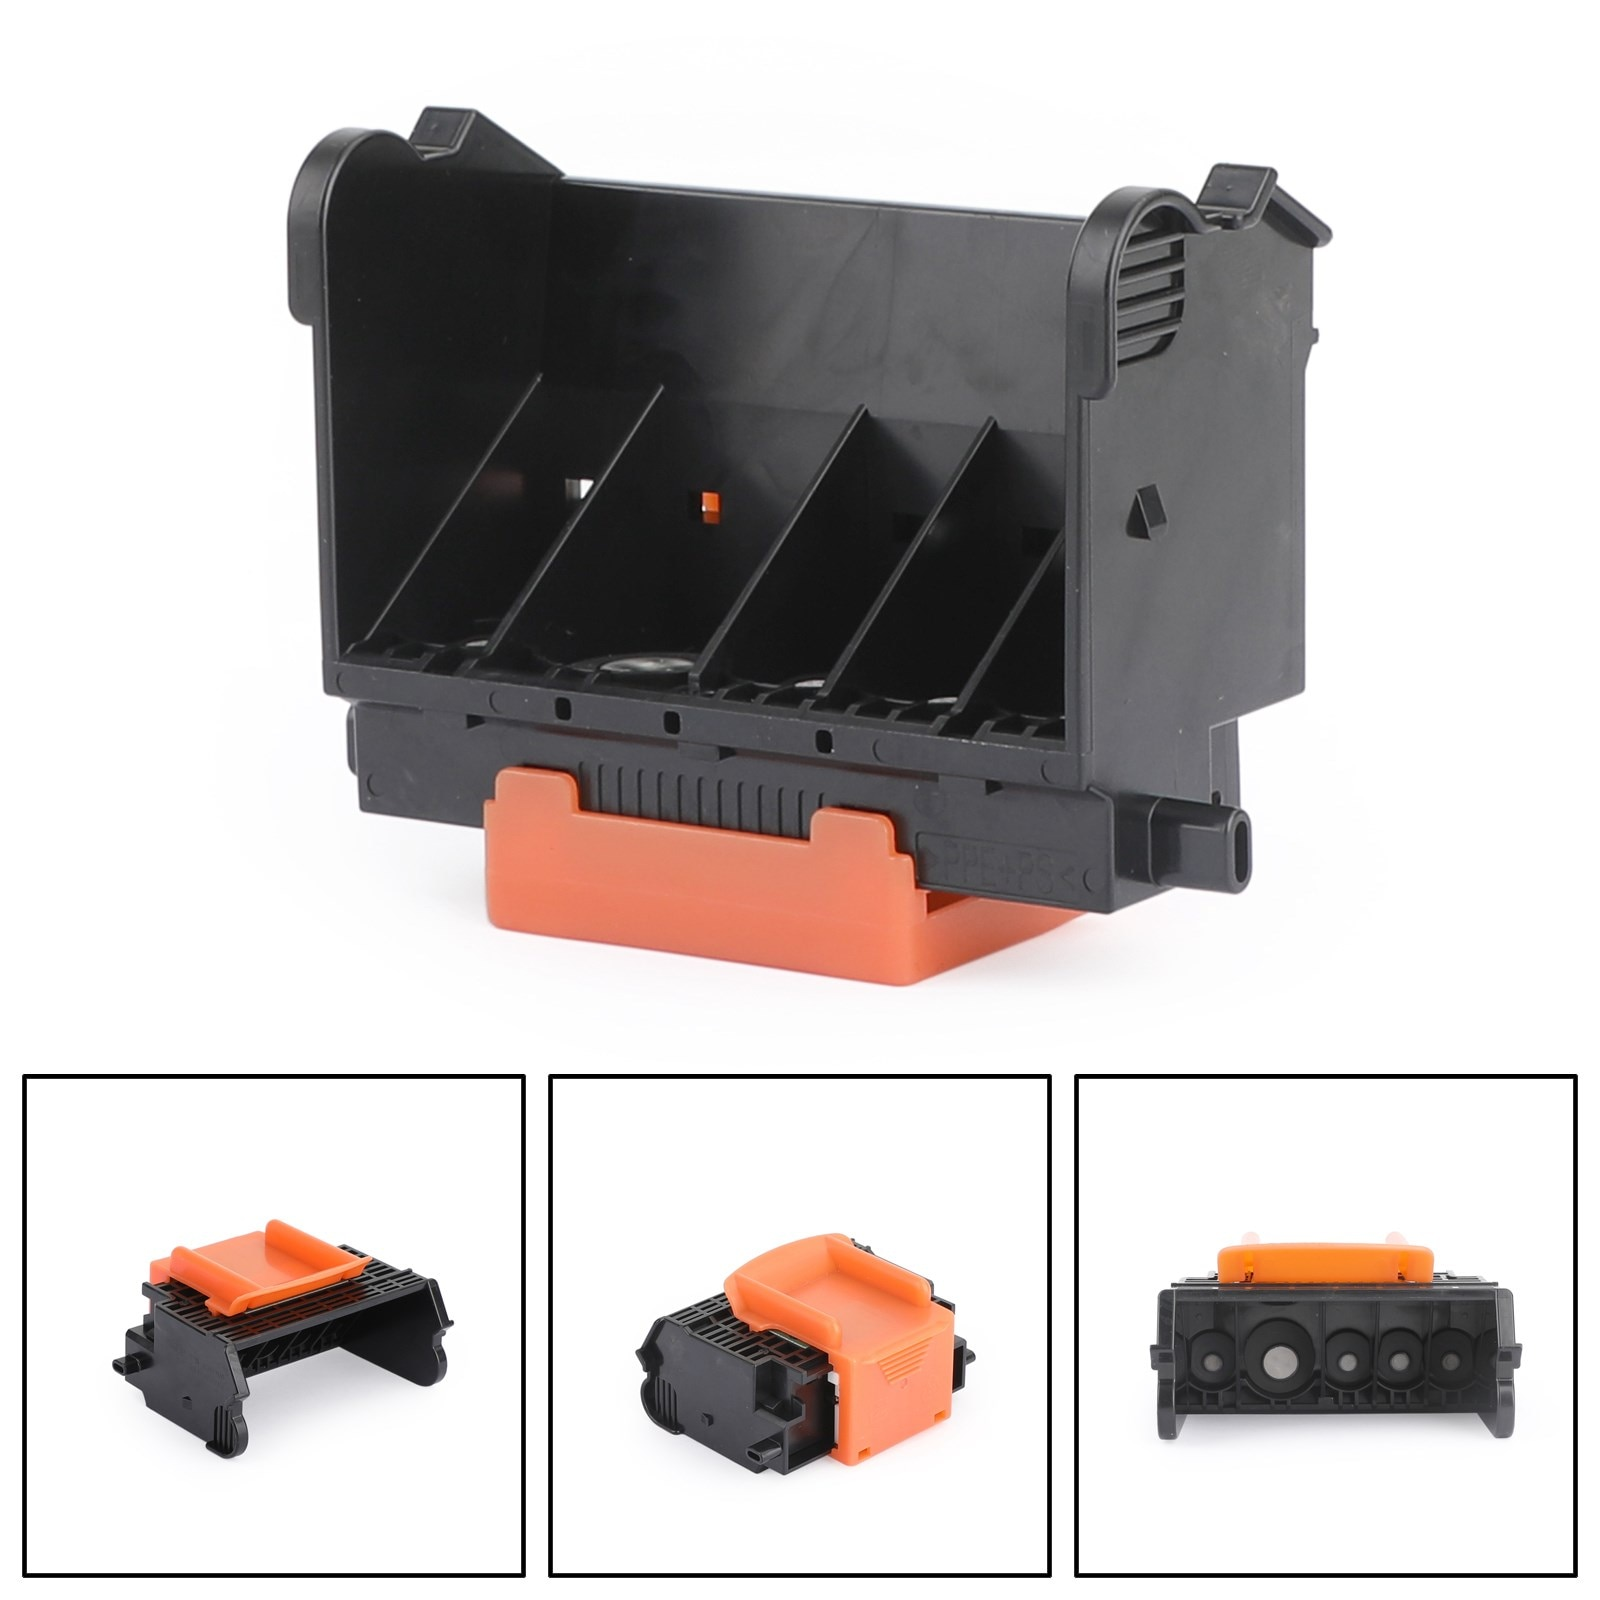 Artudatech كامل اللون QY6-0059 استبدال رأس الطباعة الطابعة رئيس ل IP4200 MP500 MP530